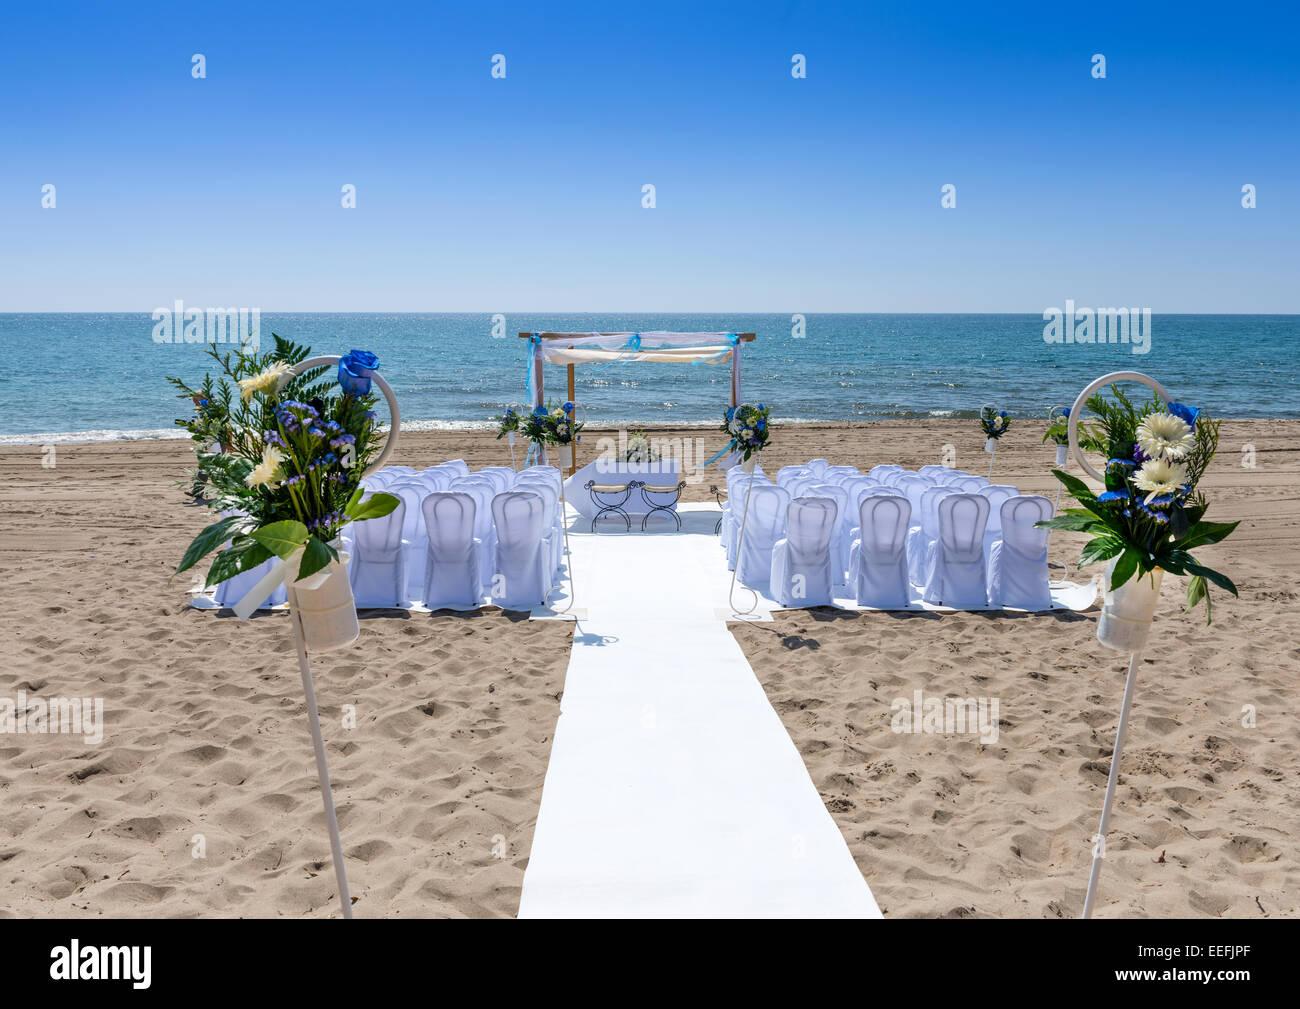 Wedding Venue On The Beach At Mojacar Almeria Province Andalusia Spain